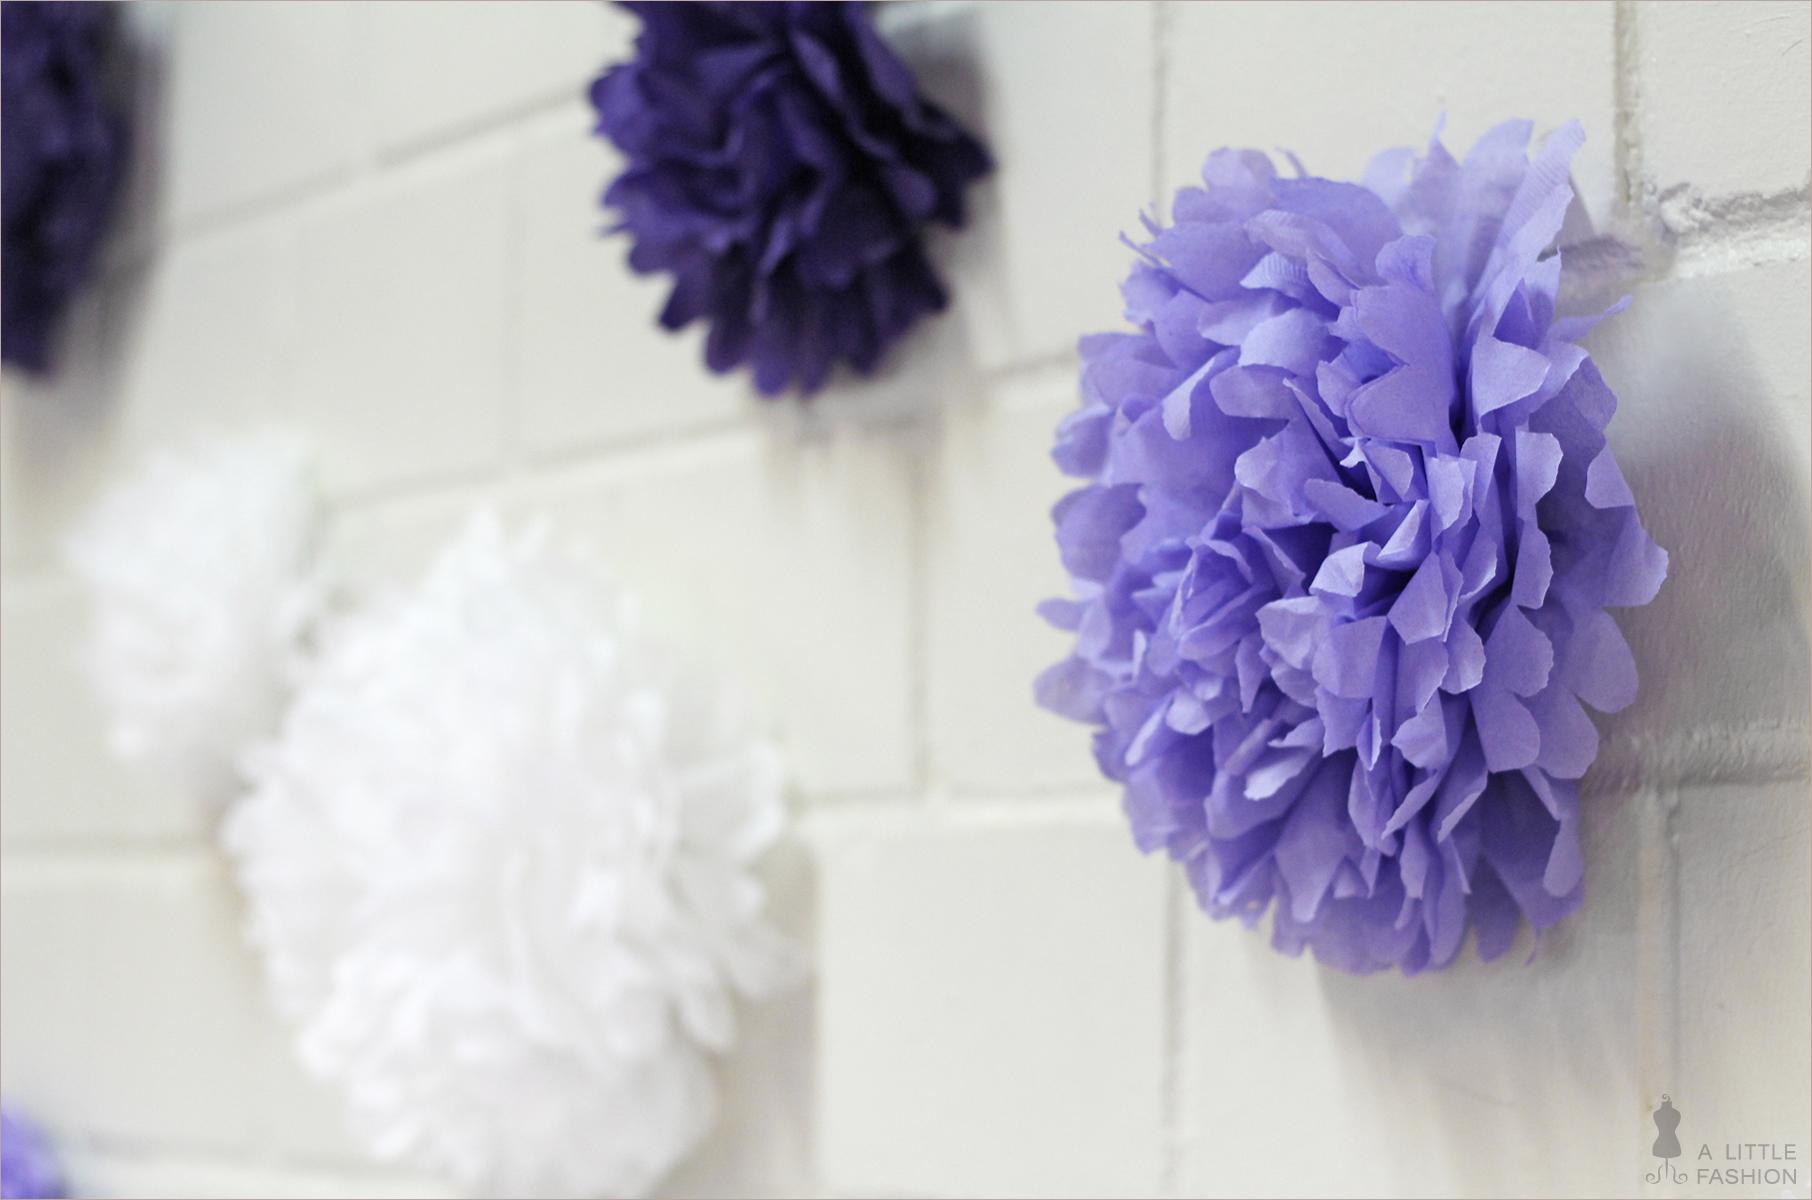 Zarte Pompons für die Wand